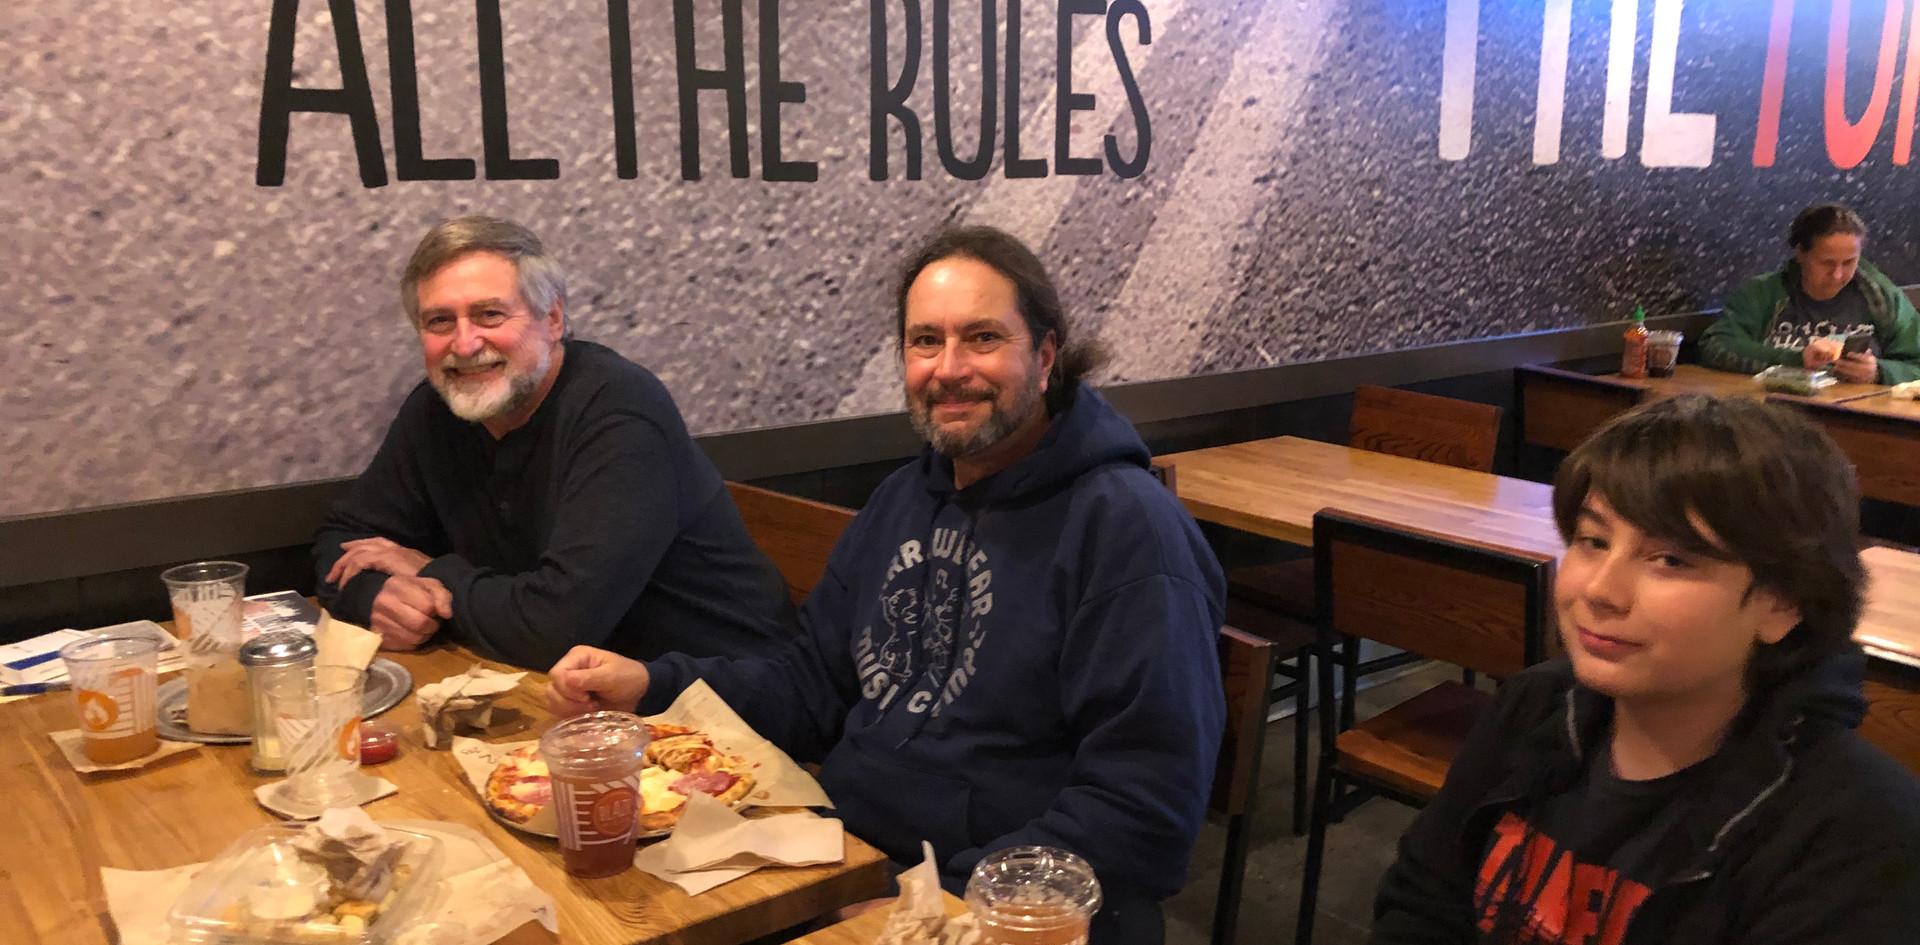 Jeff Haberman, David James, Jack James.j